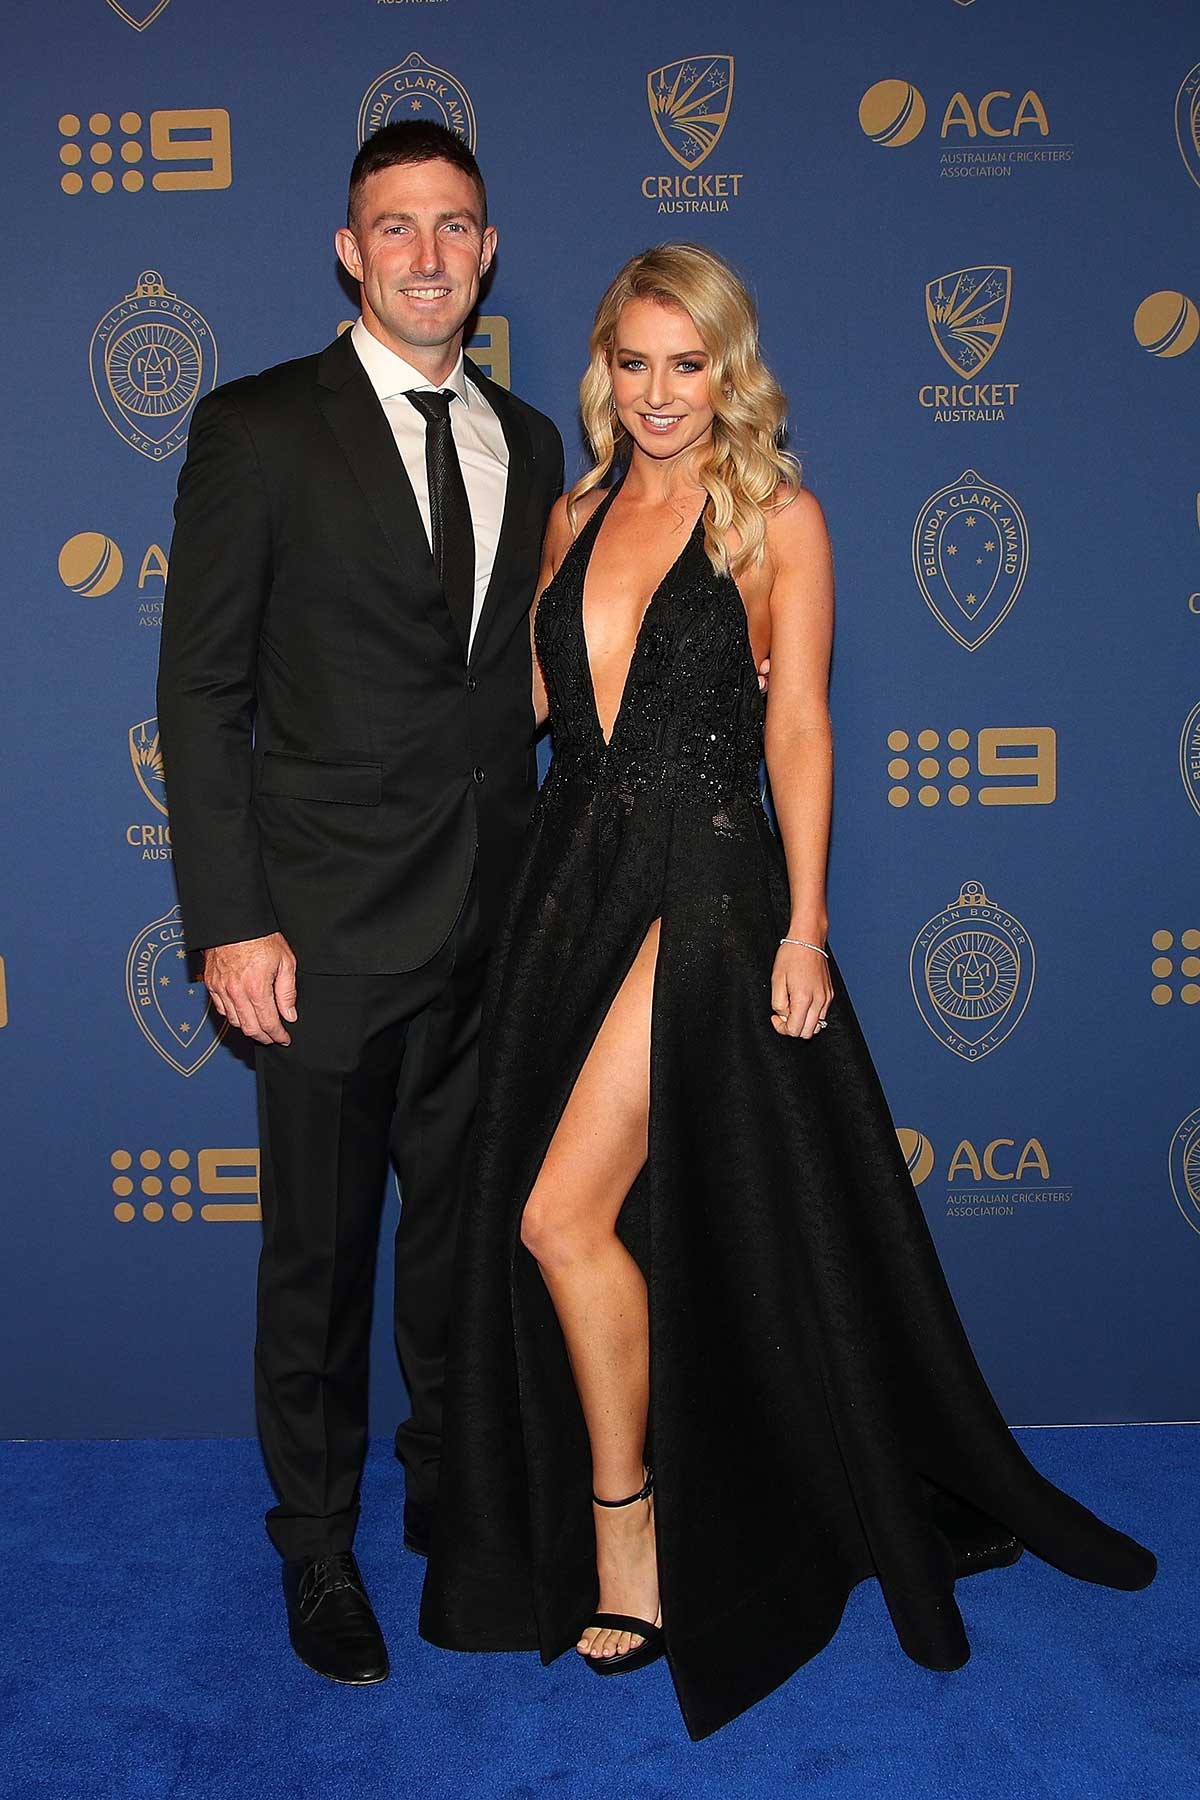 Shaun Marsh and wife Rebecca // Getty